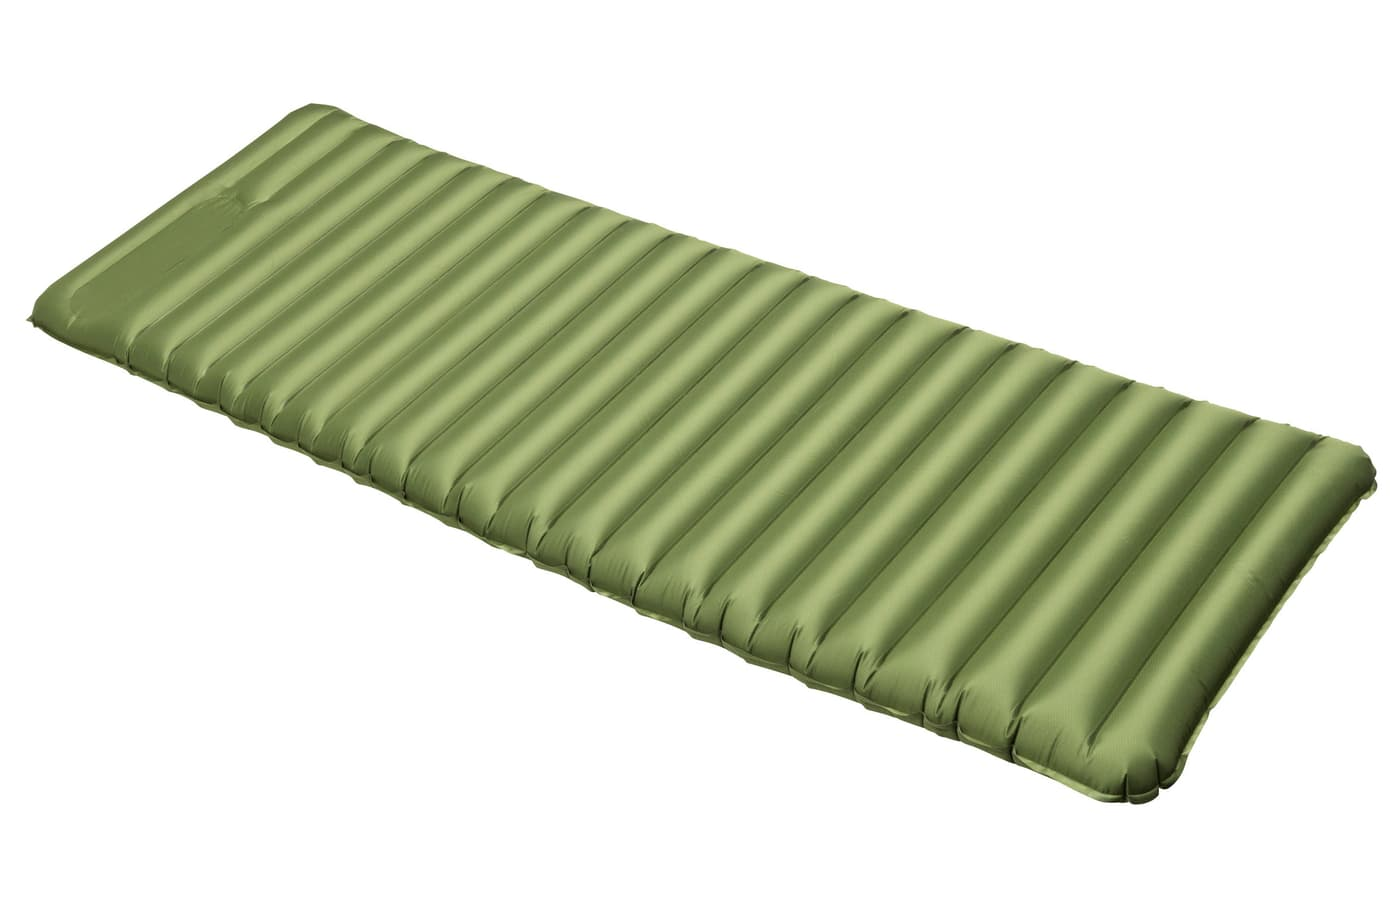 trevolution tube air large matelas isolant gonflable migros. Black Bedroom Furniture Sets. Home Design Ideas